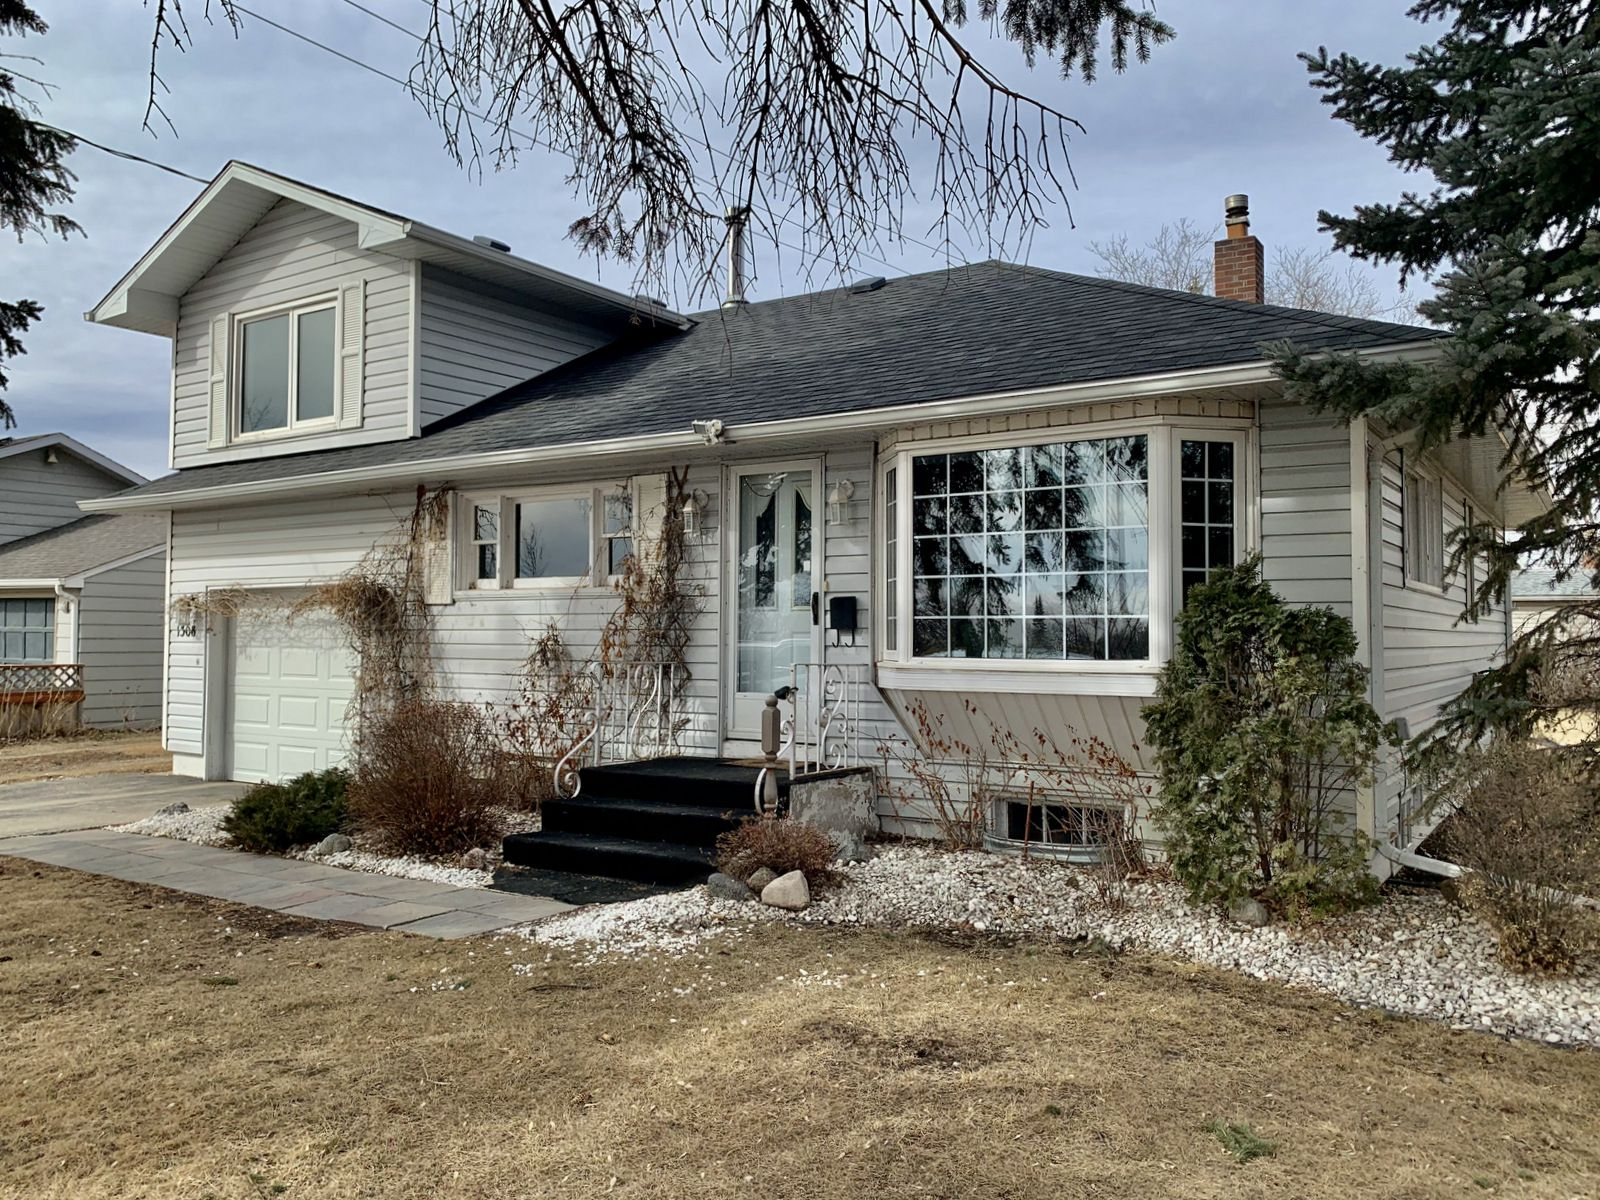 Main Photo: 1308 Crescent Road in Portage la Prairie: House for sale : MLS®# 202105436